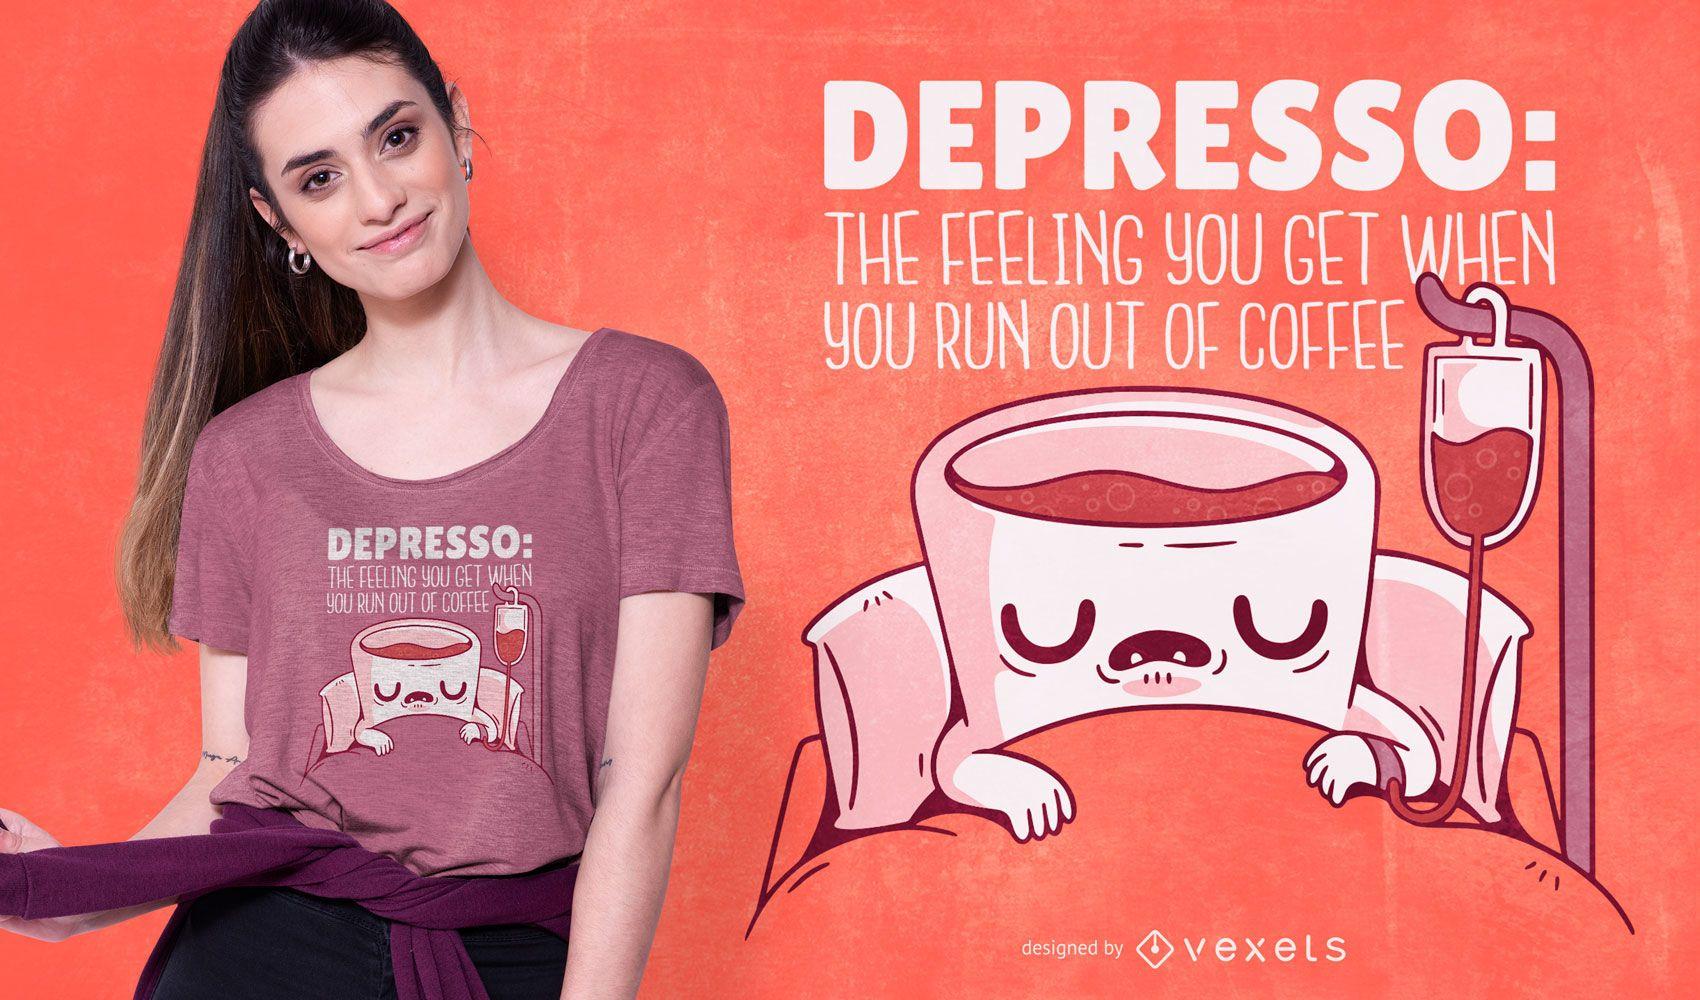 Depresso coffee quote t-shirt design